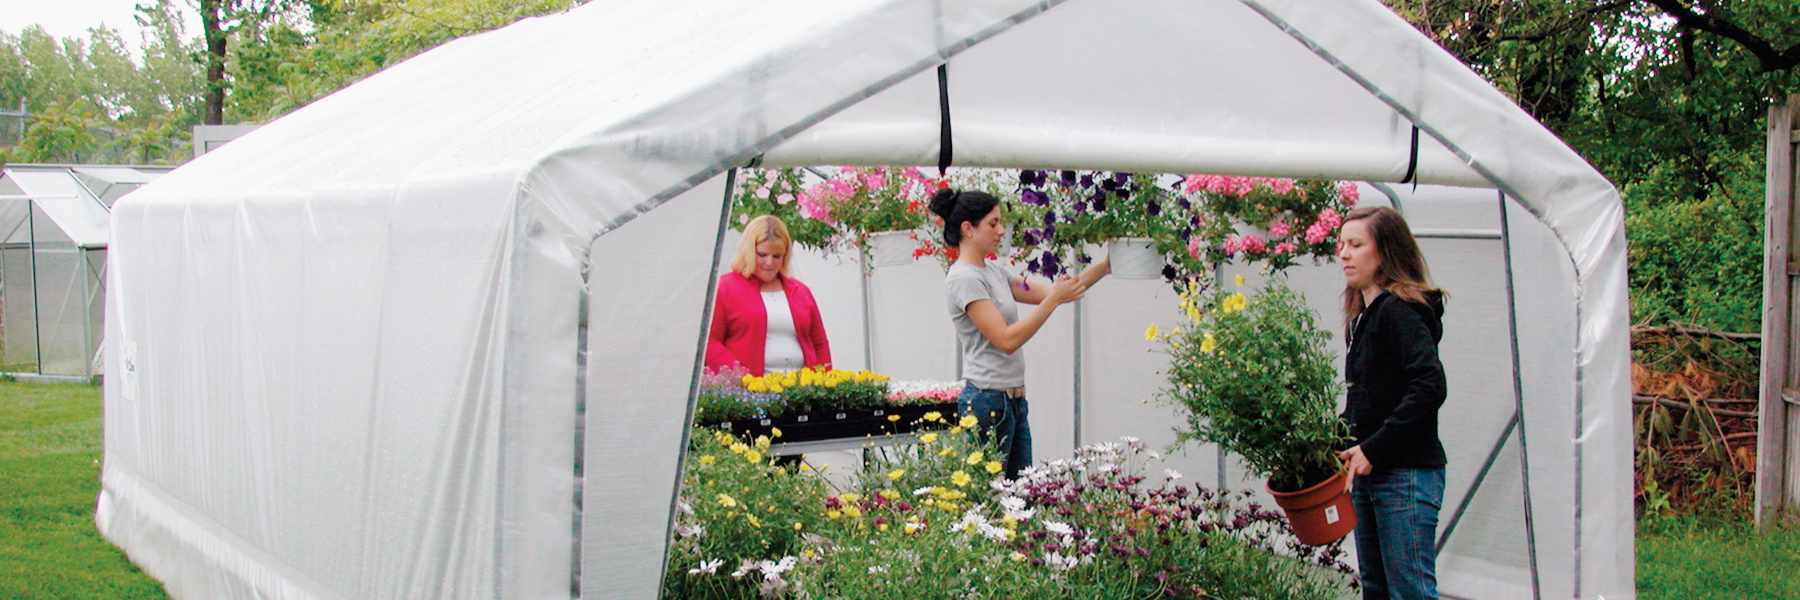 Gothic Pro greenhouse